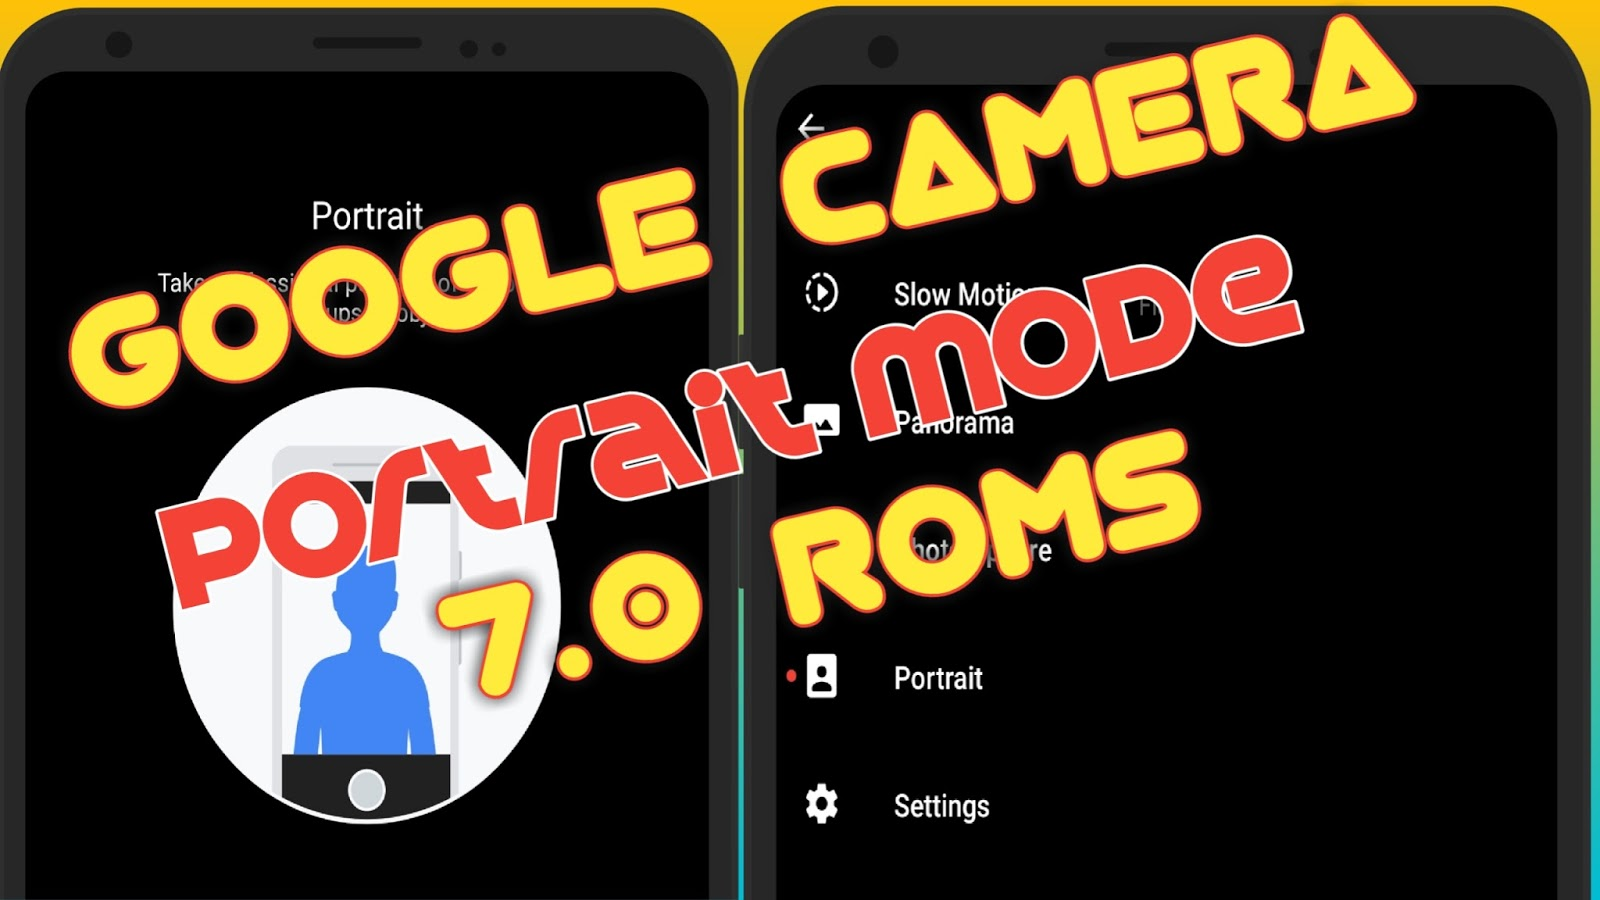 latest google camera apk for mi a1